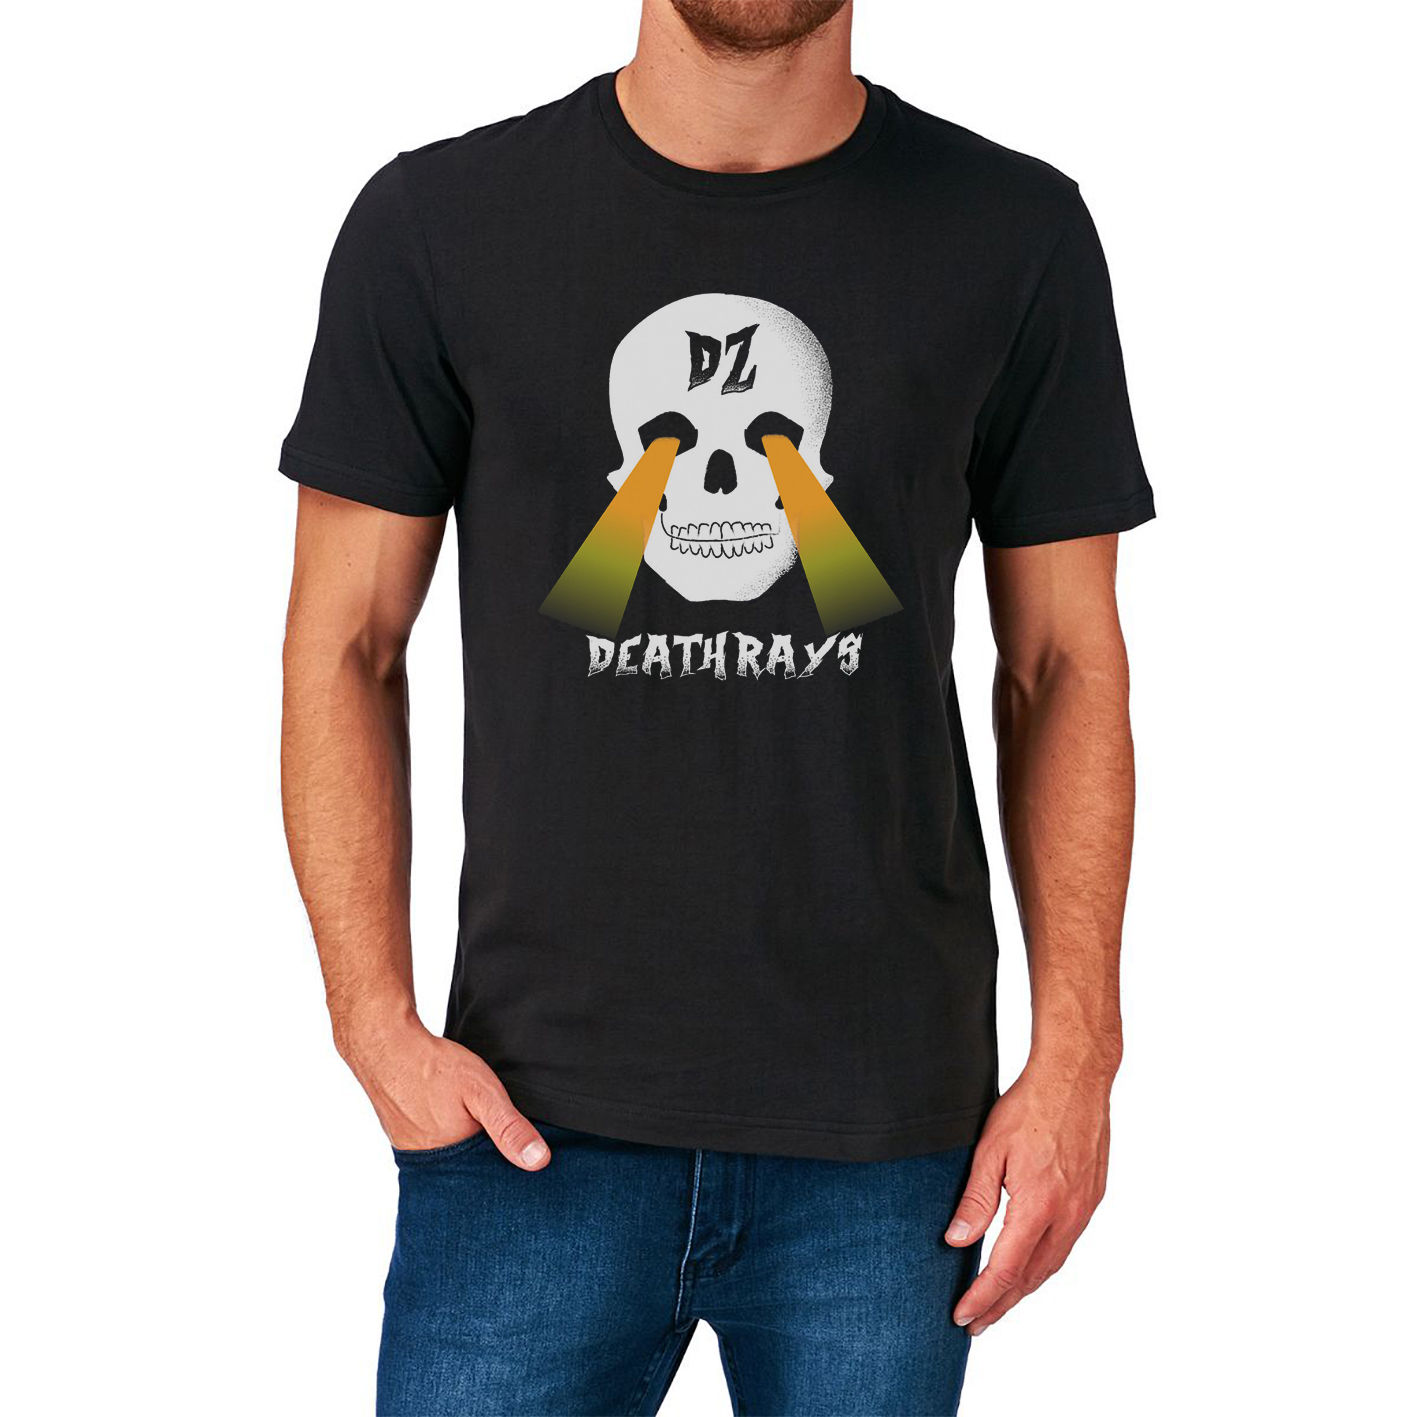 Shirt design australia - 2017 Summer Fashion Dz Deathraysdance Punk Heavy Metal Hard Rock Music Australia Design T Shirt Tops